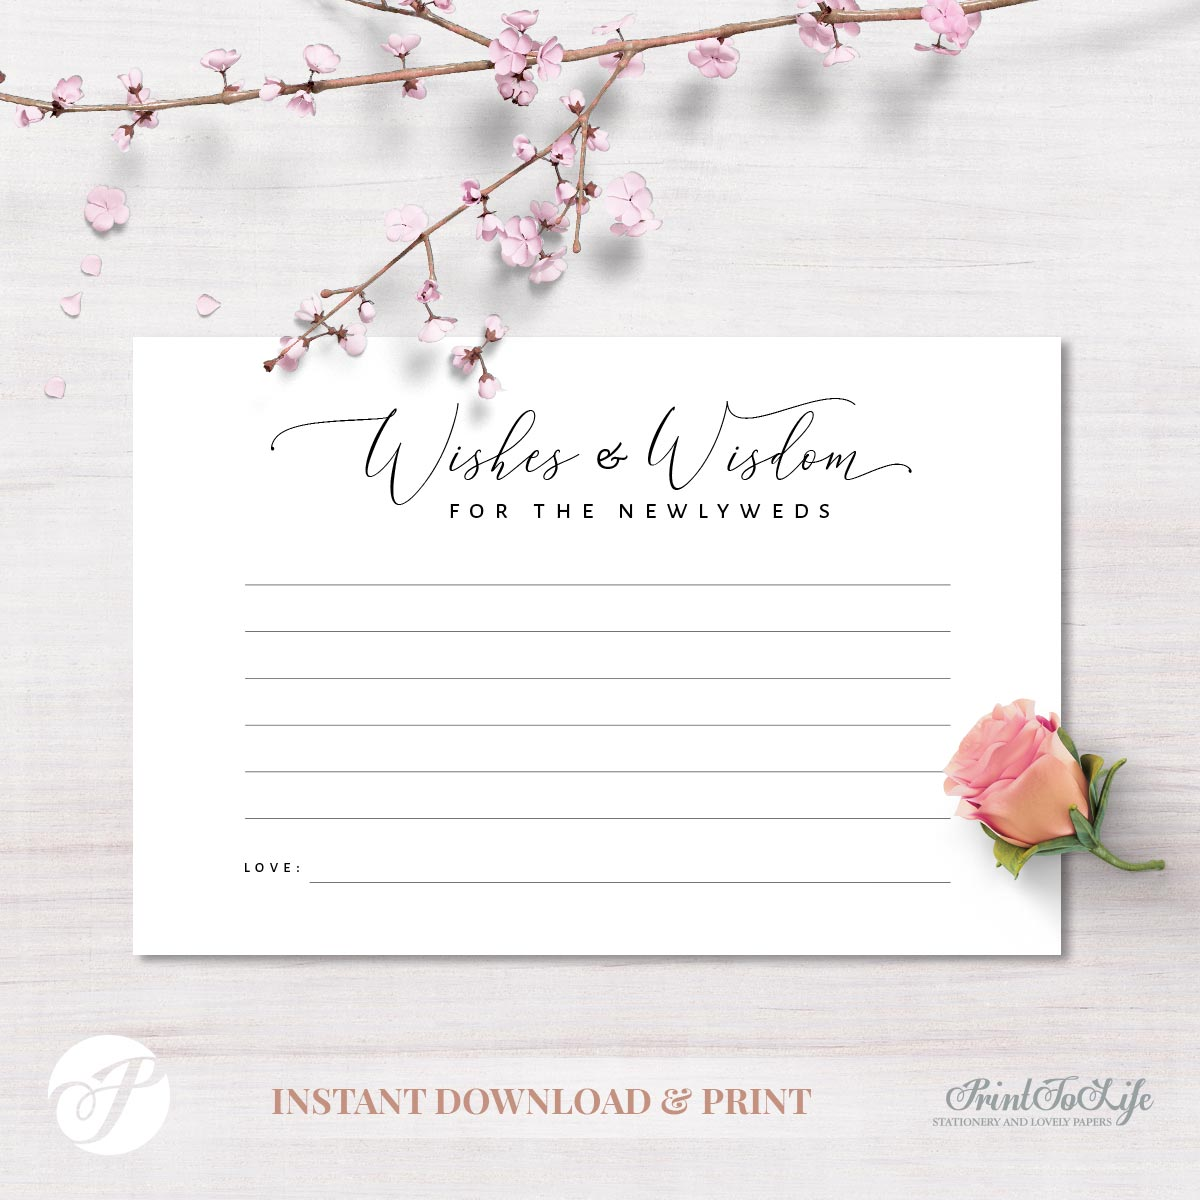 Wedding Advice Card by Printolife